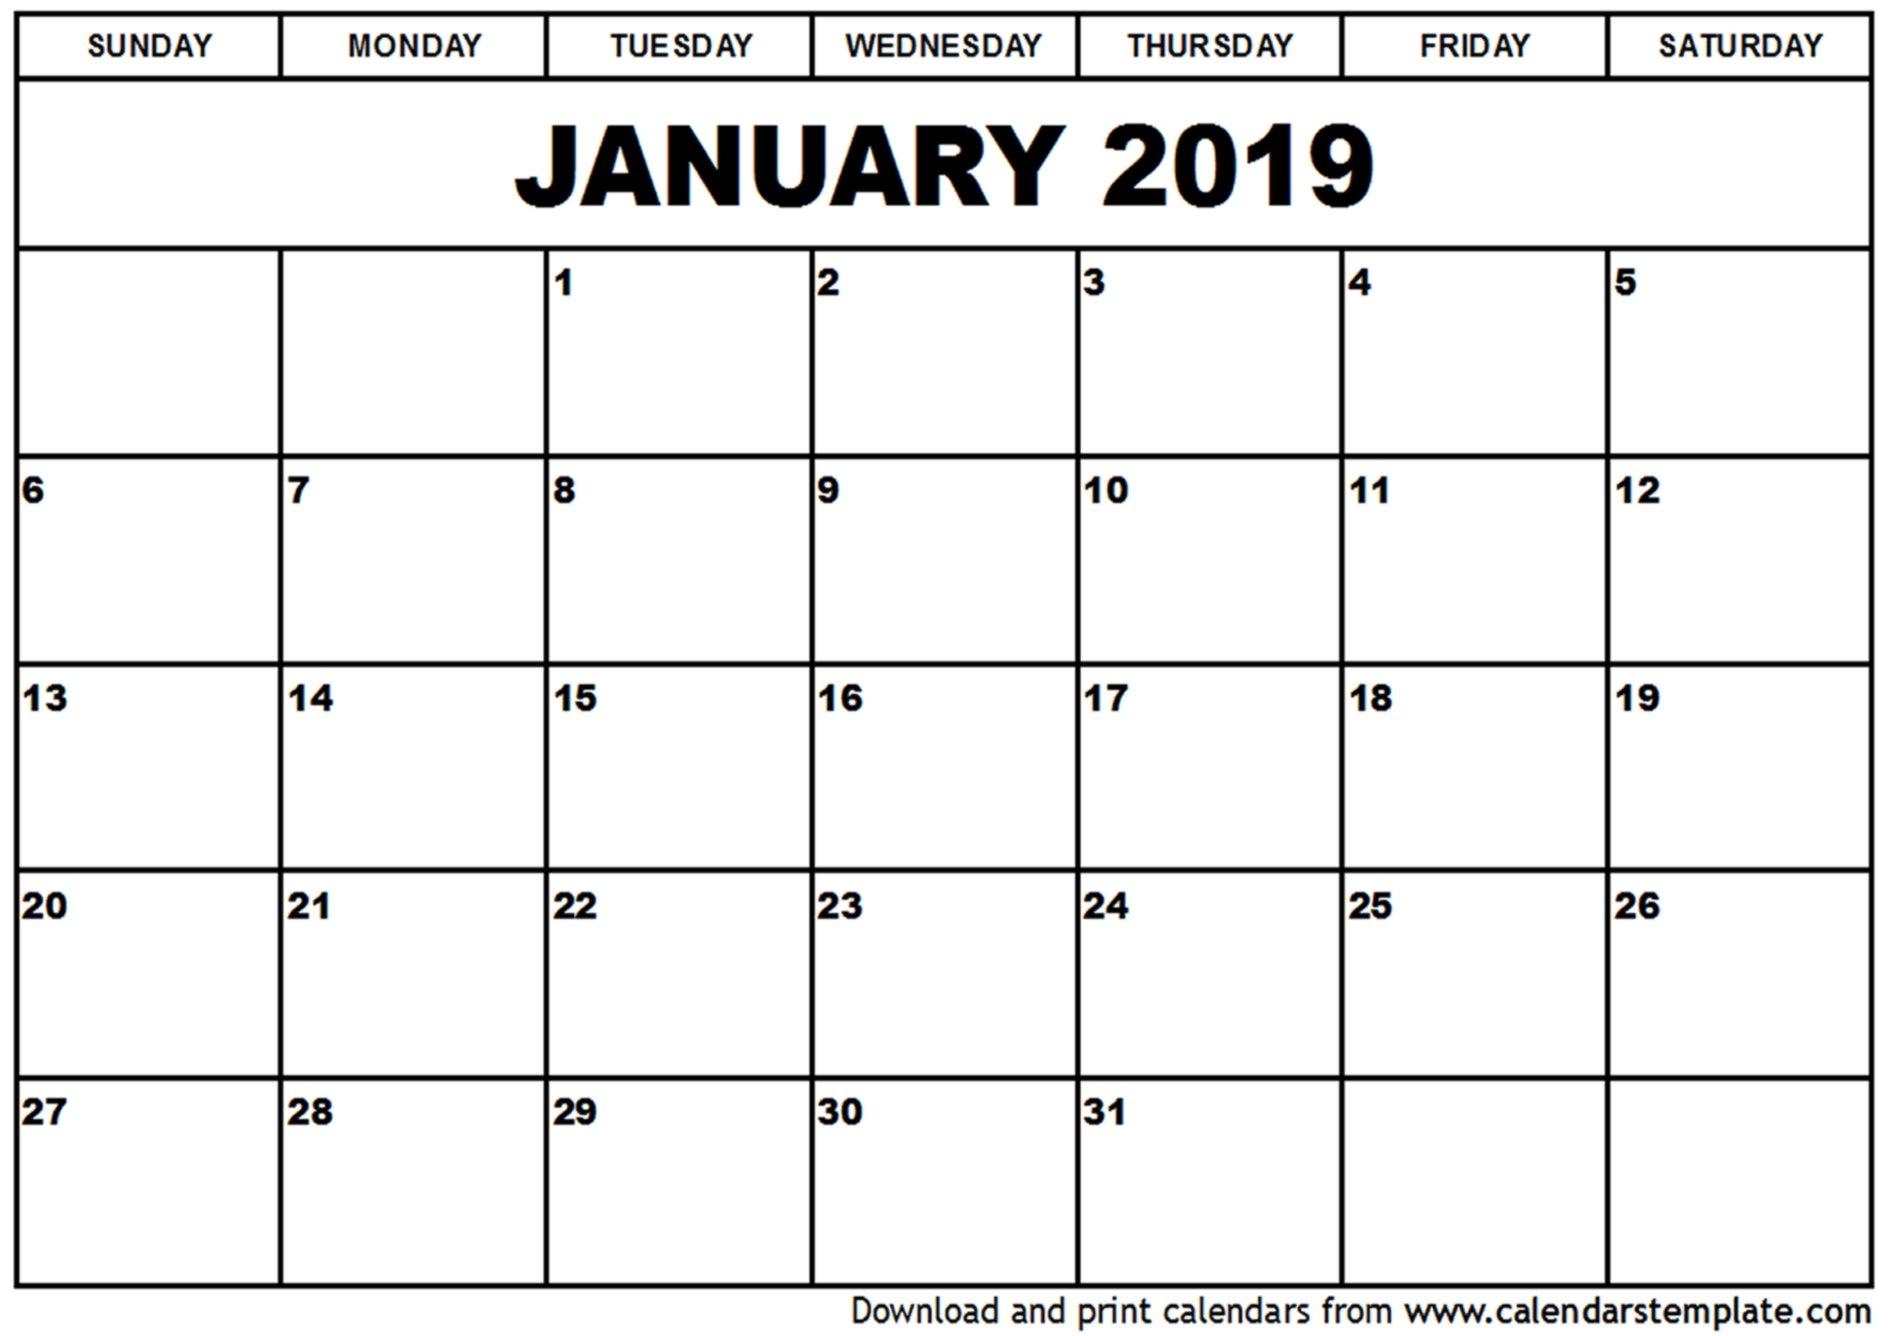 January 2019 Printable Calendar   2018 Yearly Calendar Calendar 2019 Za Printanje